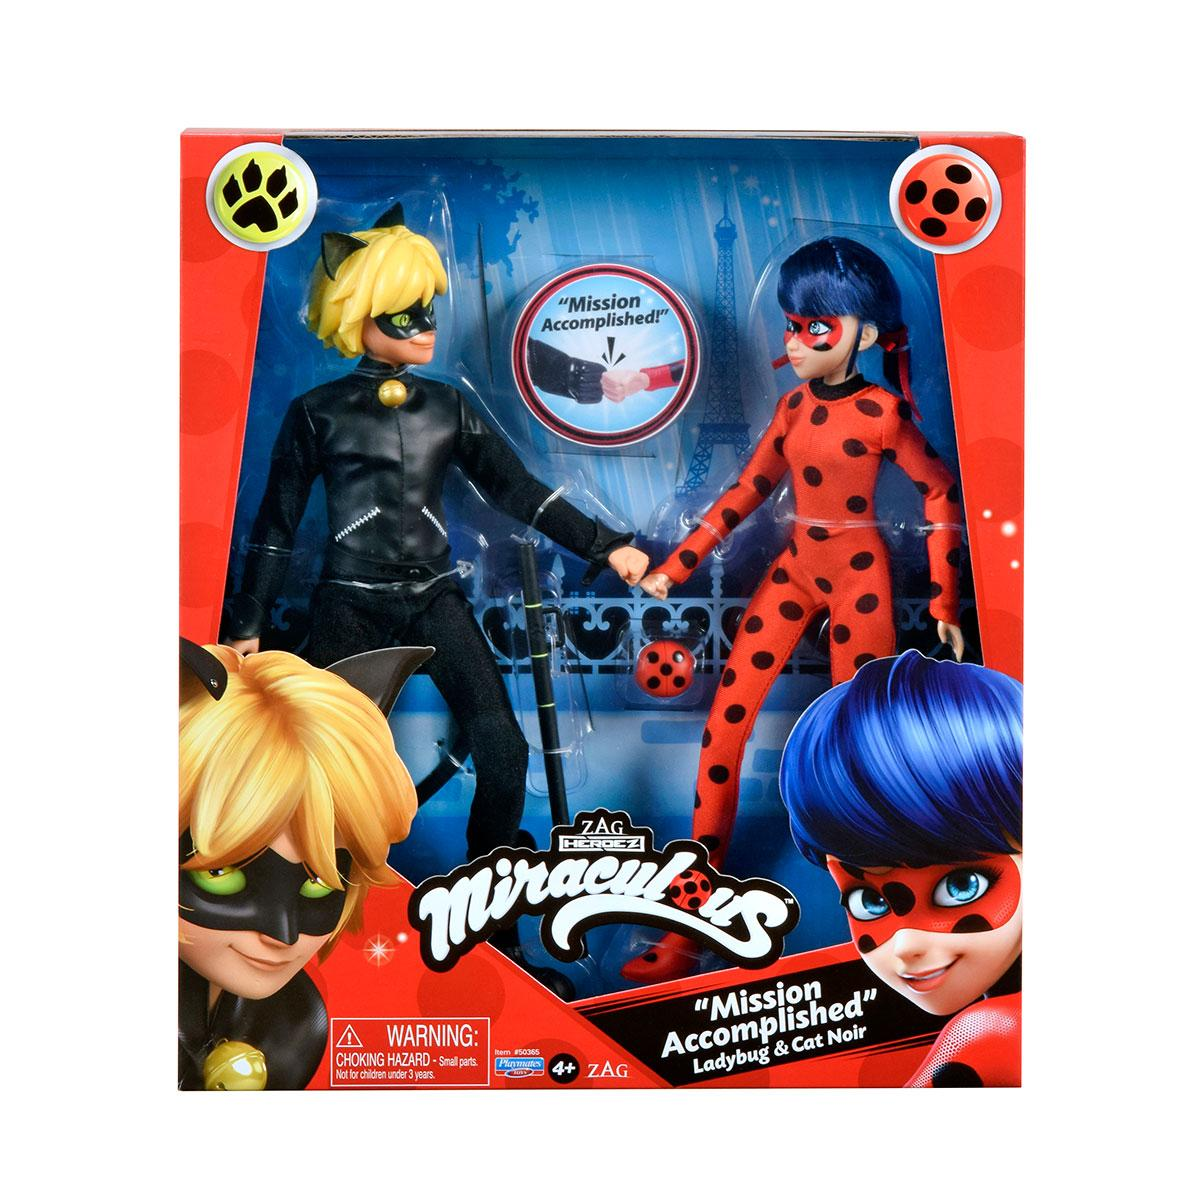 Набор 2-х кукол из мультика Леди Баг и Супер Кот S2 – Миссия выполнена 26 см с аксессуарами (50365)